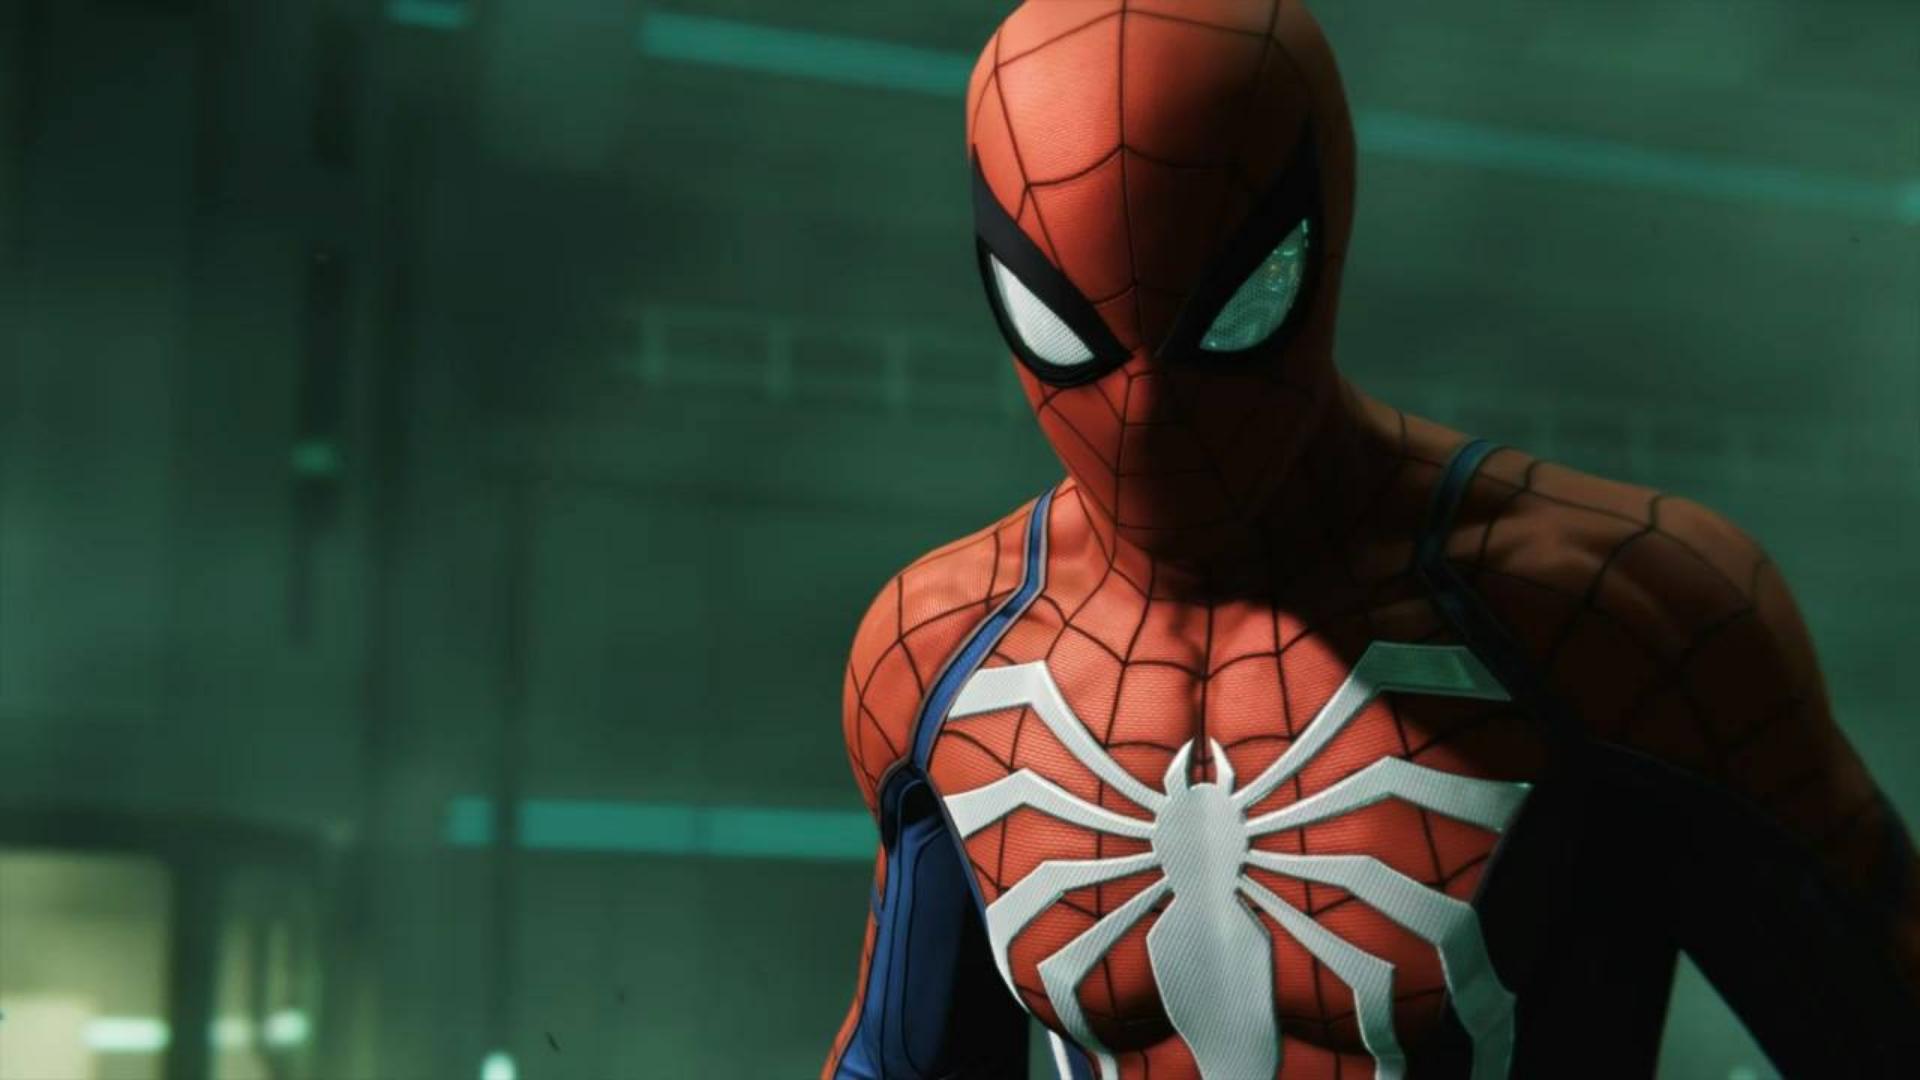 【PS4】【漫威蜘蛛侠】马丁·李BOSS战